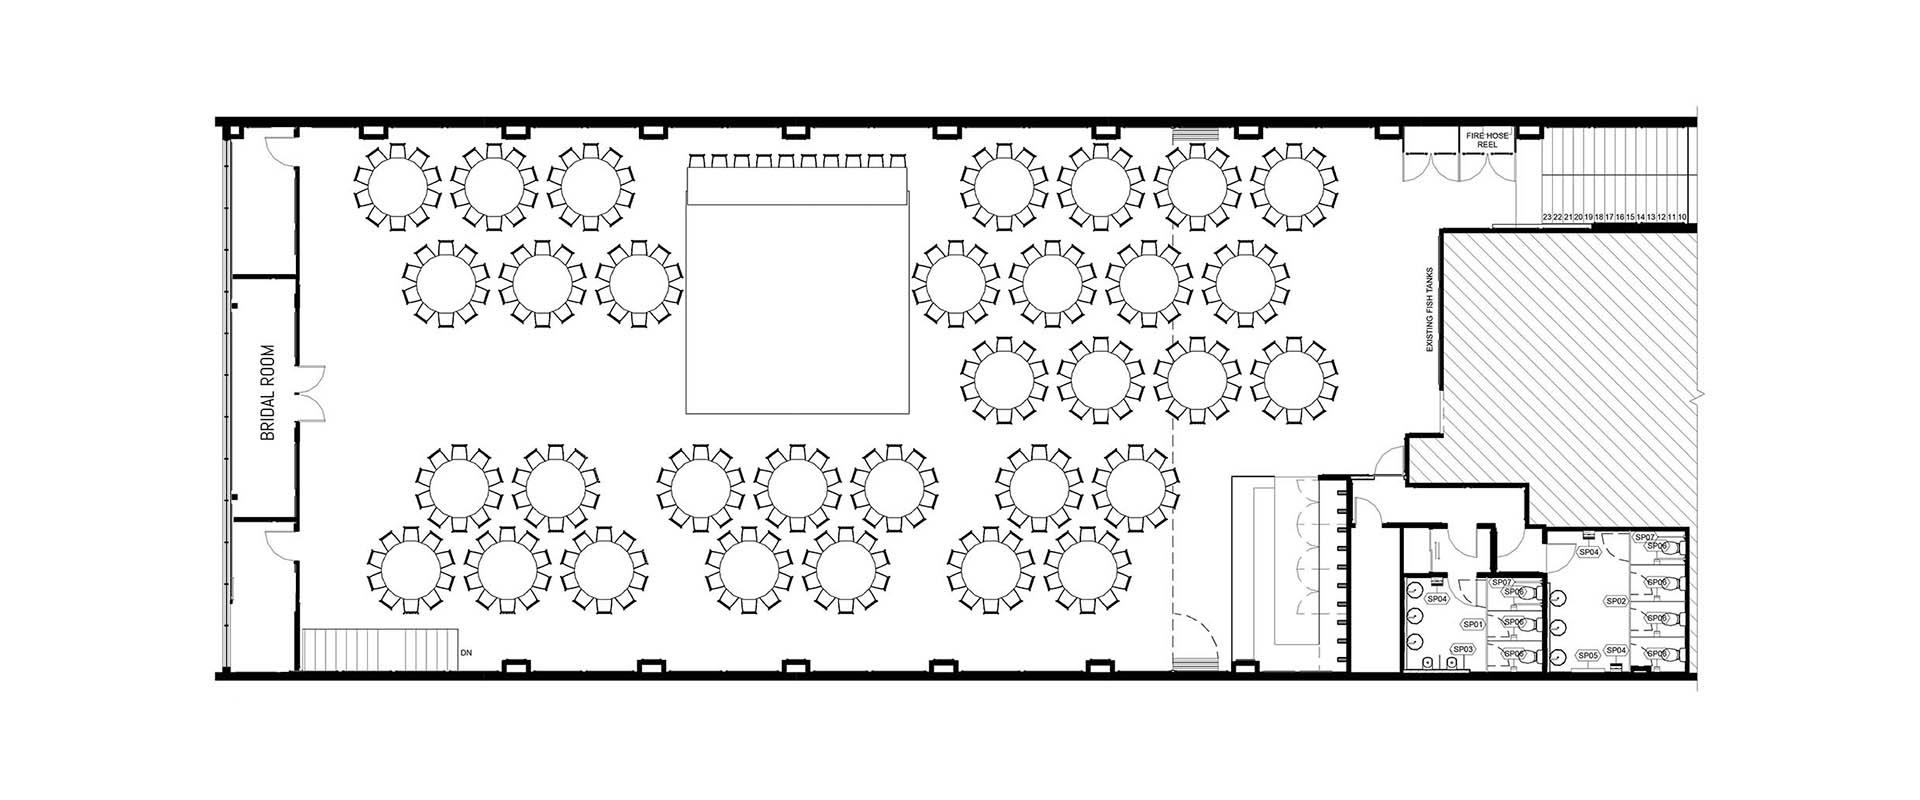 silver-pearl-cabramatta-floorplan.jpg